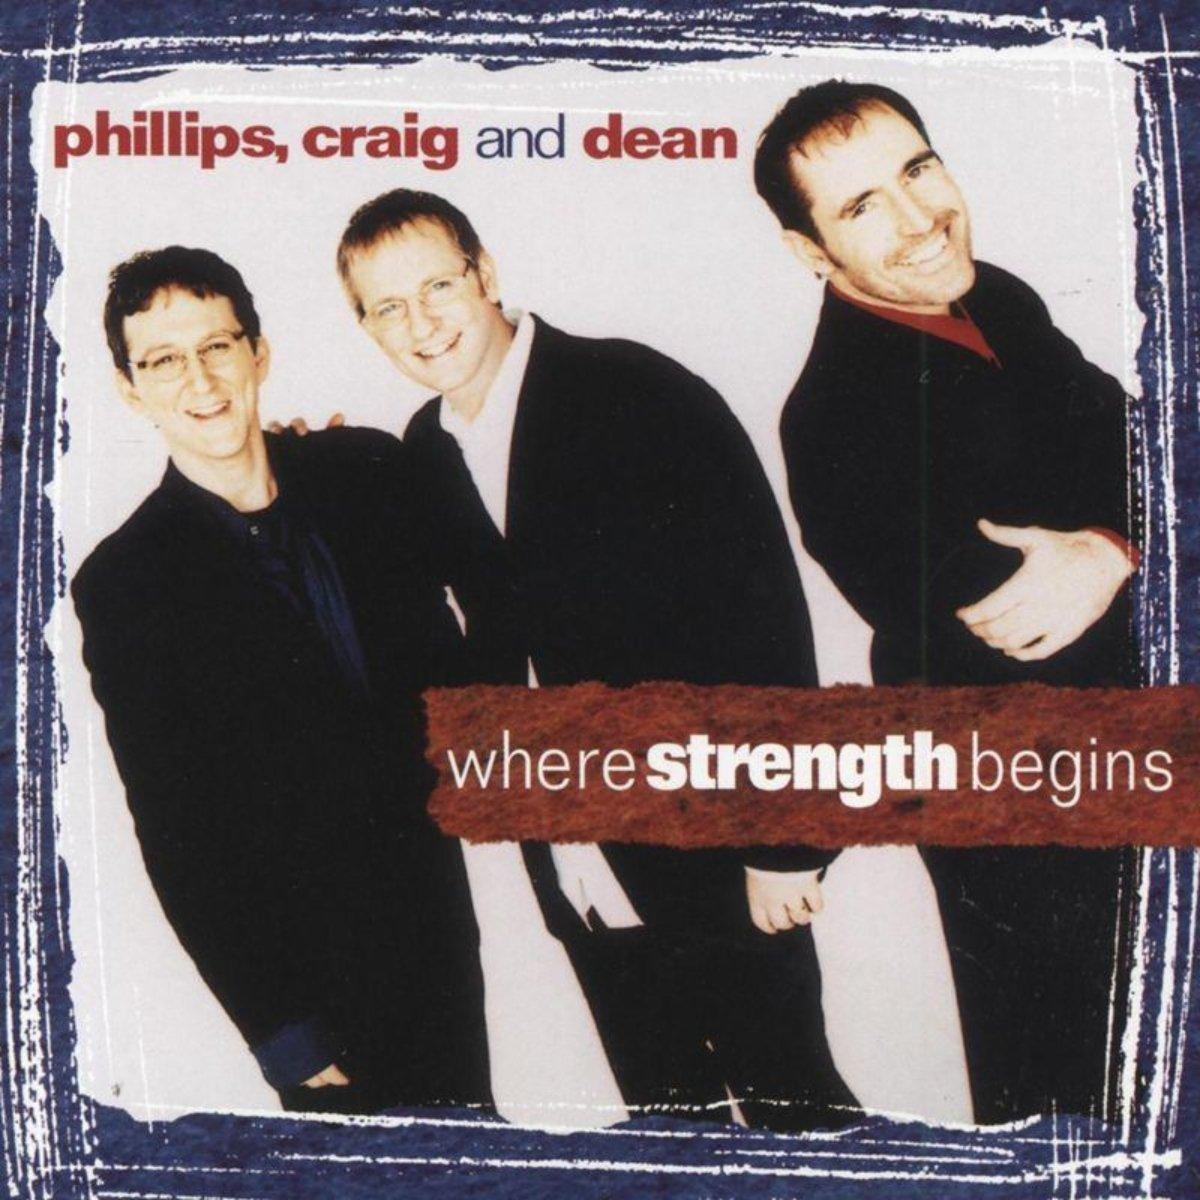 Phillips Craig And Dean – Where Strength Begins (1997) [FLAC]